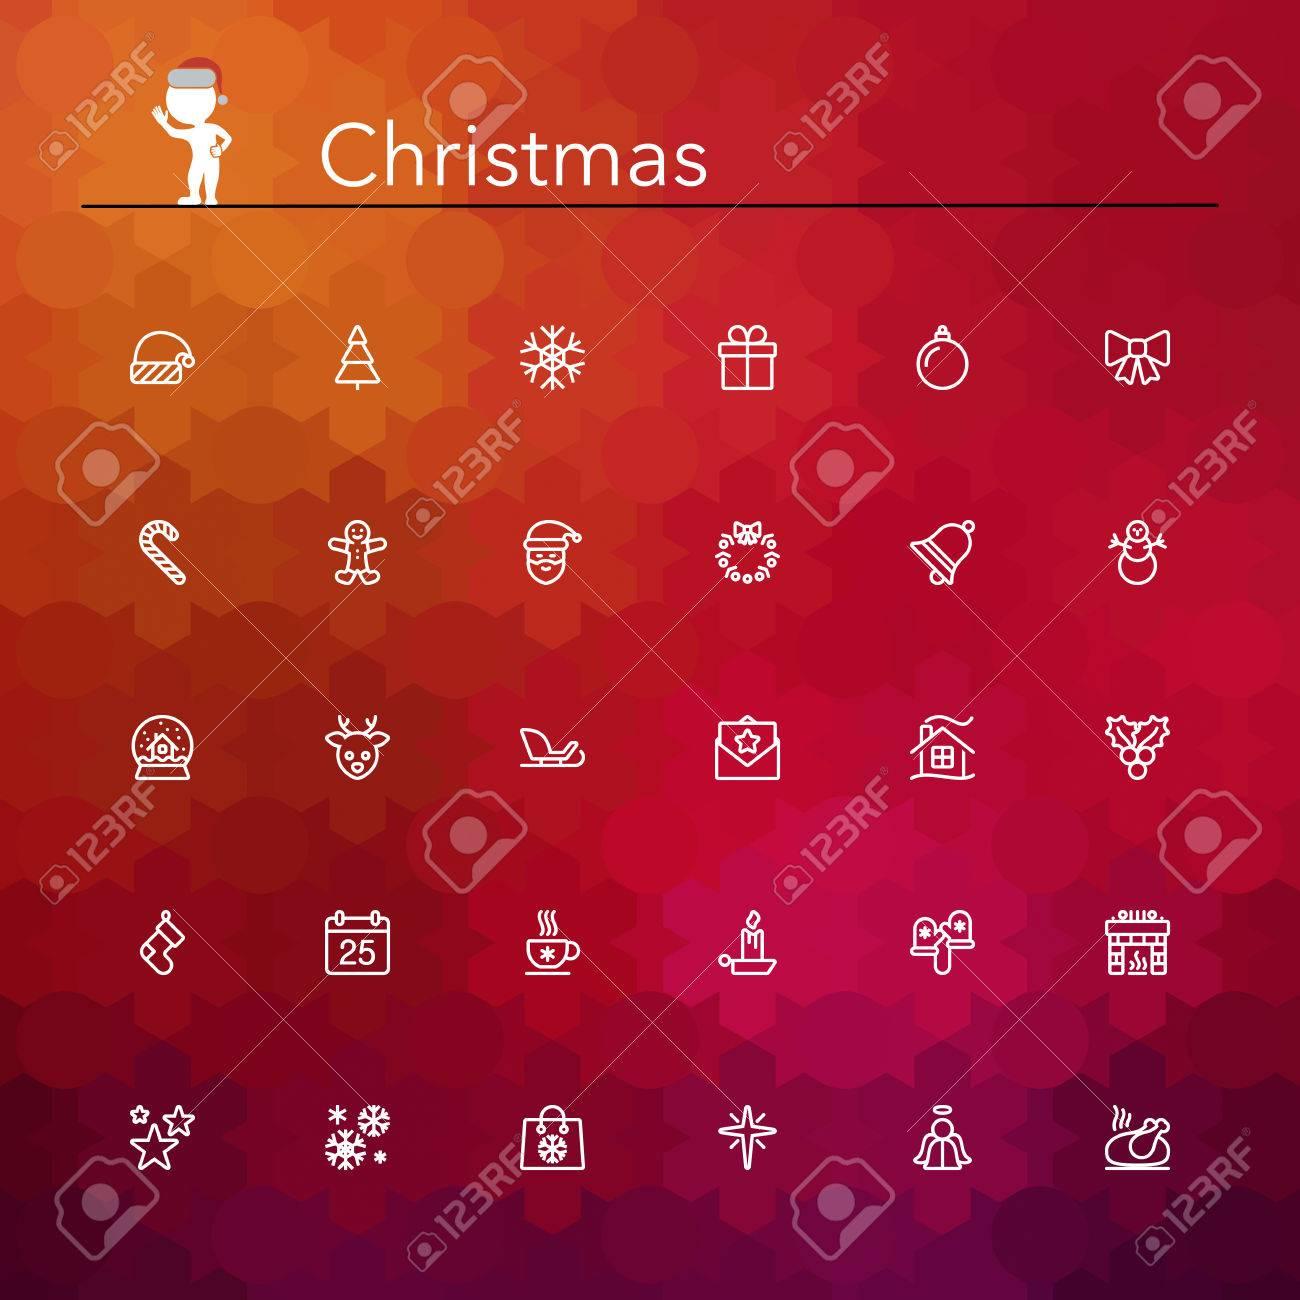 Christmas line Icons set. Vector illustration. - 32827033